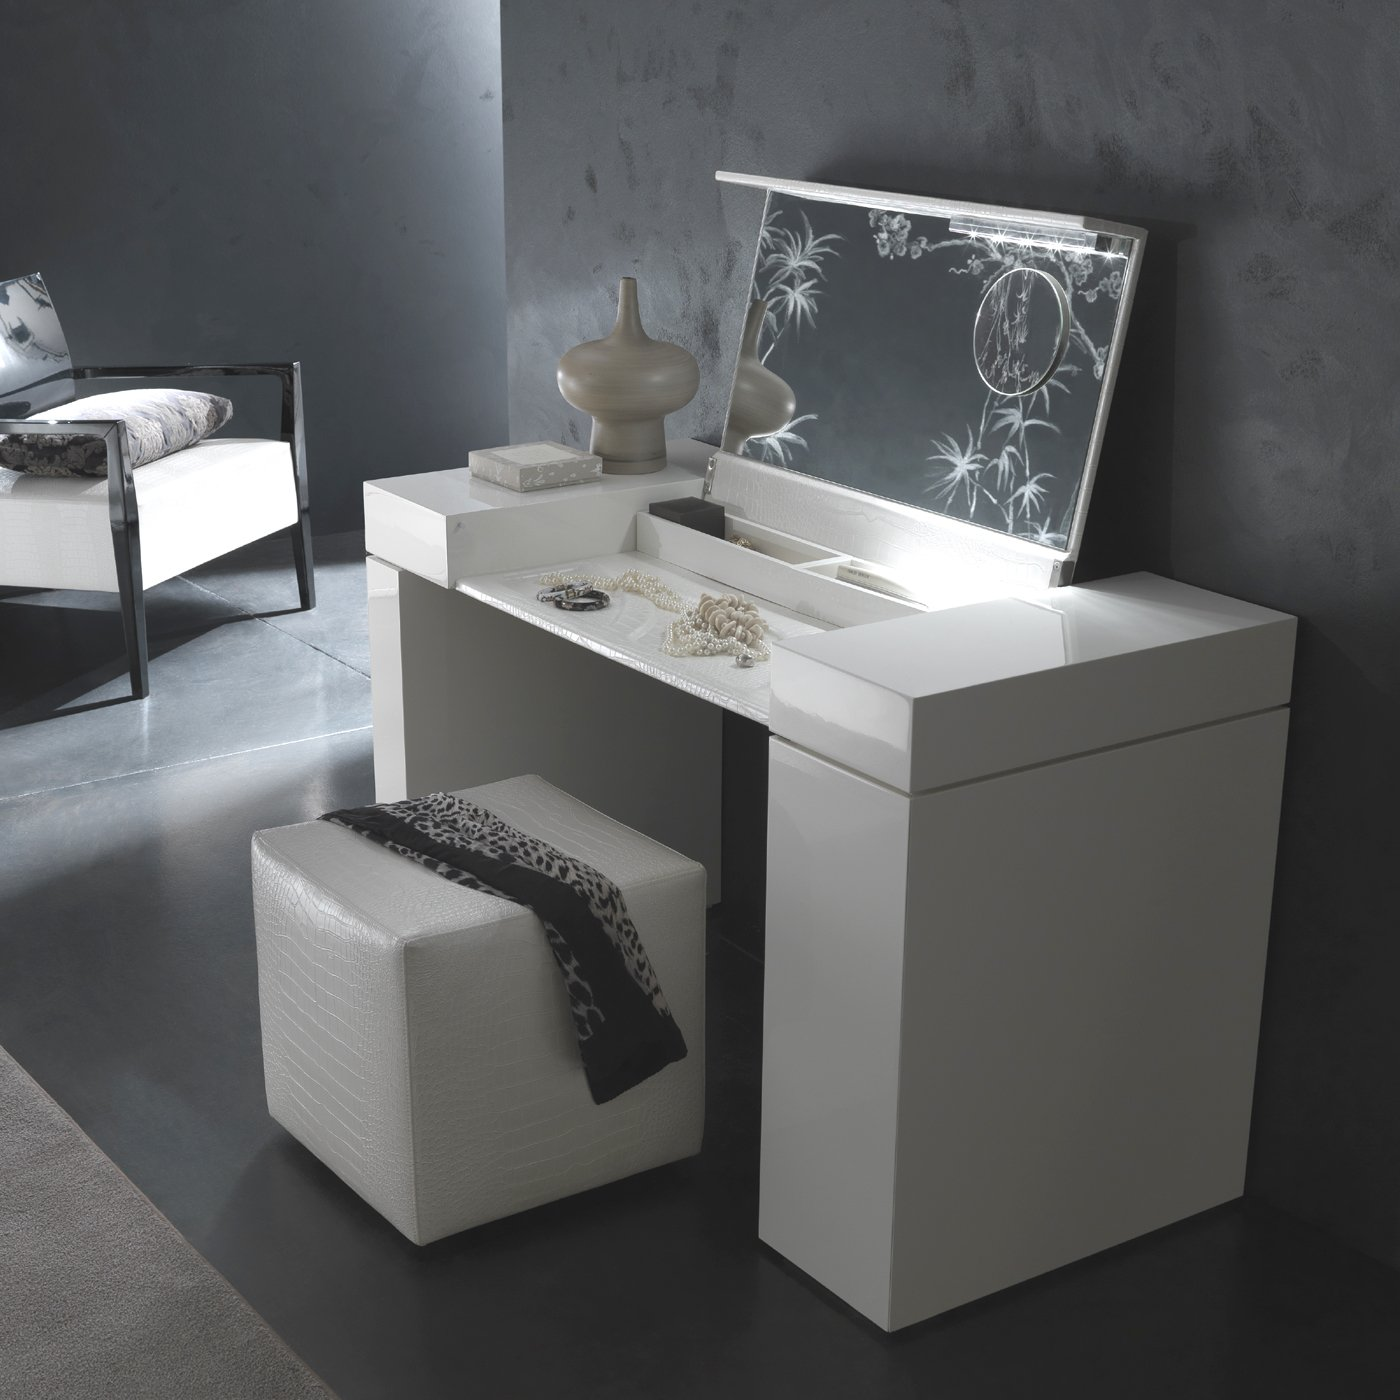 white wooden high chair